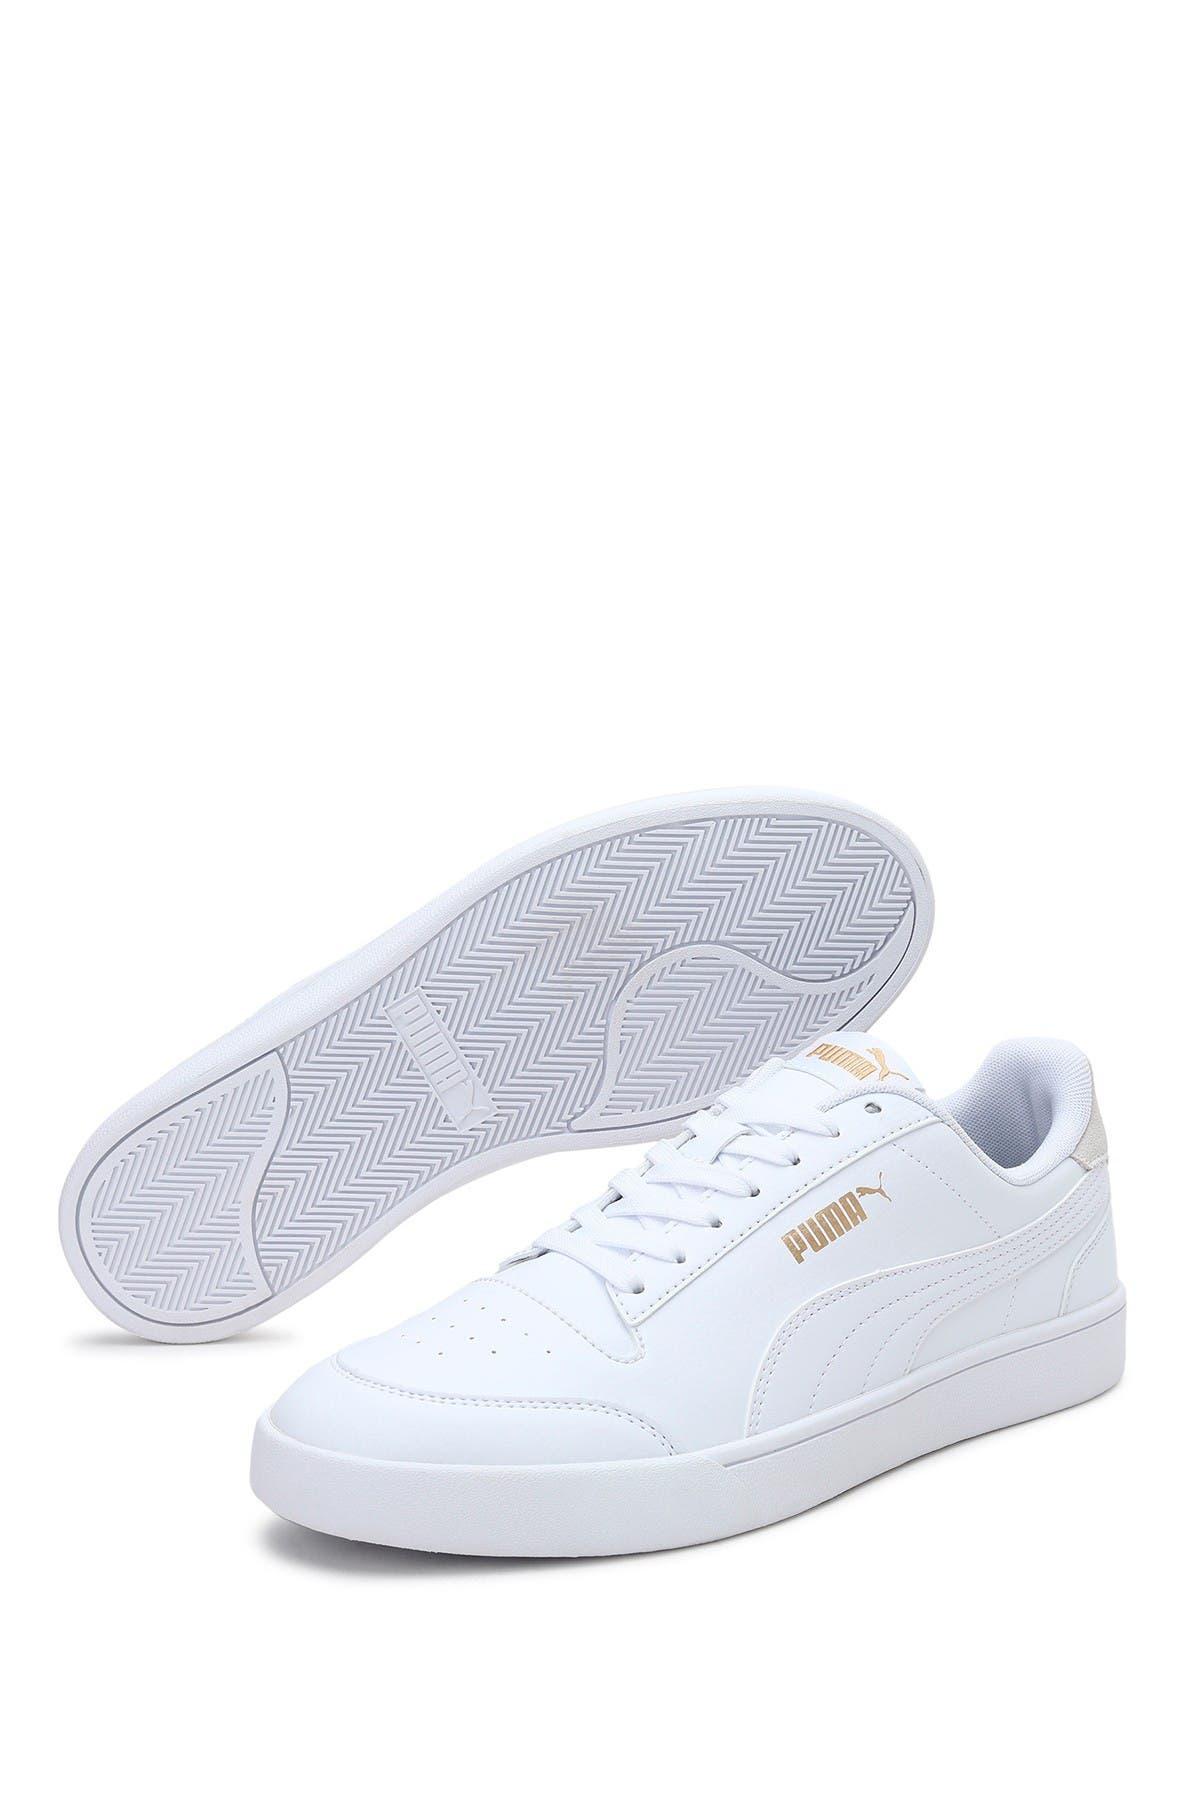 Image of PUMA Shuffle Sneaker